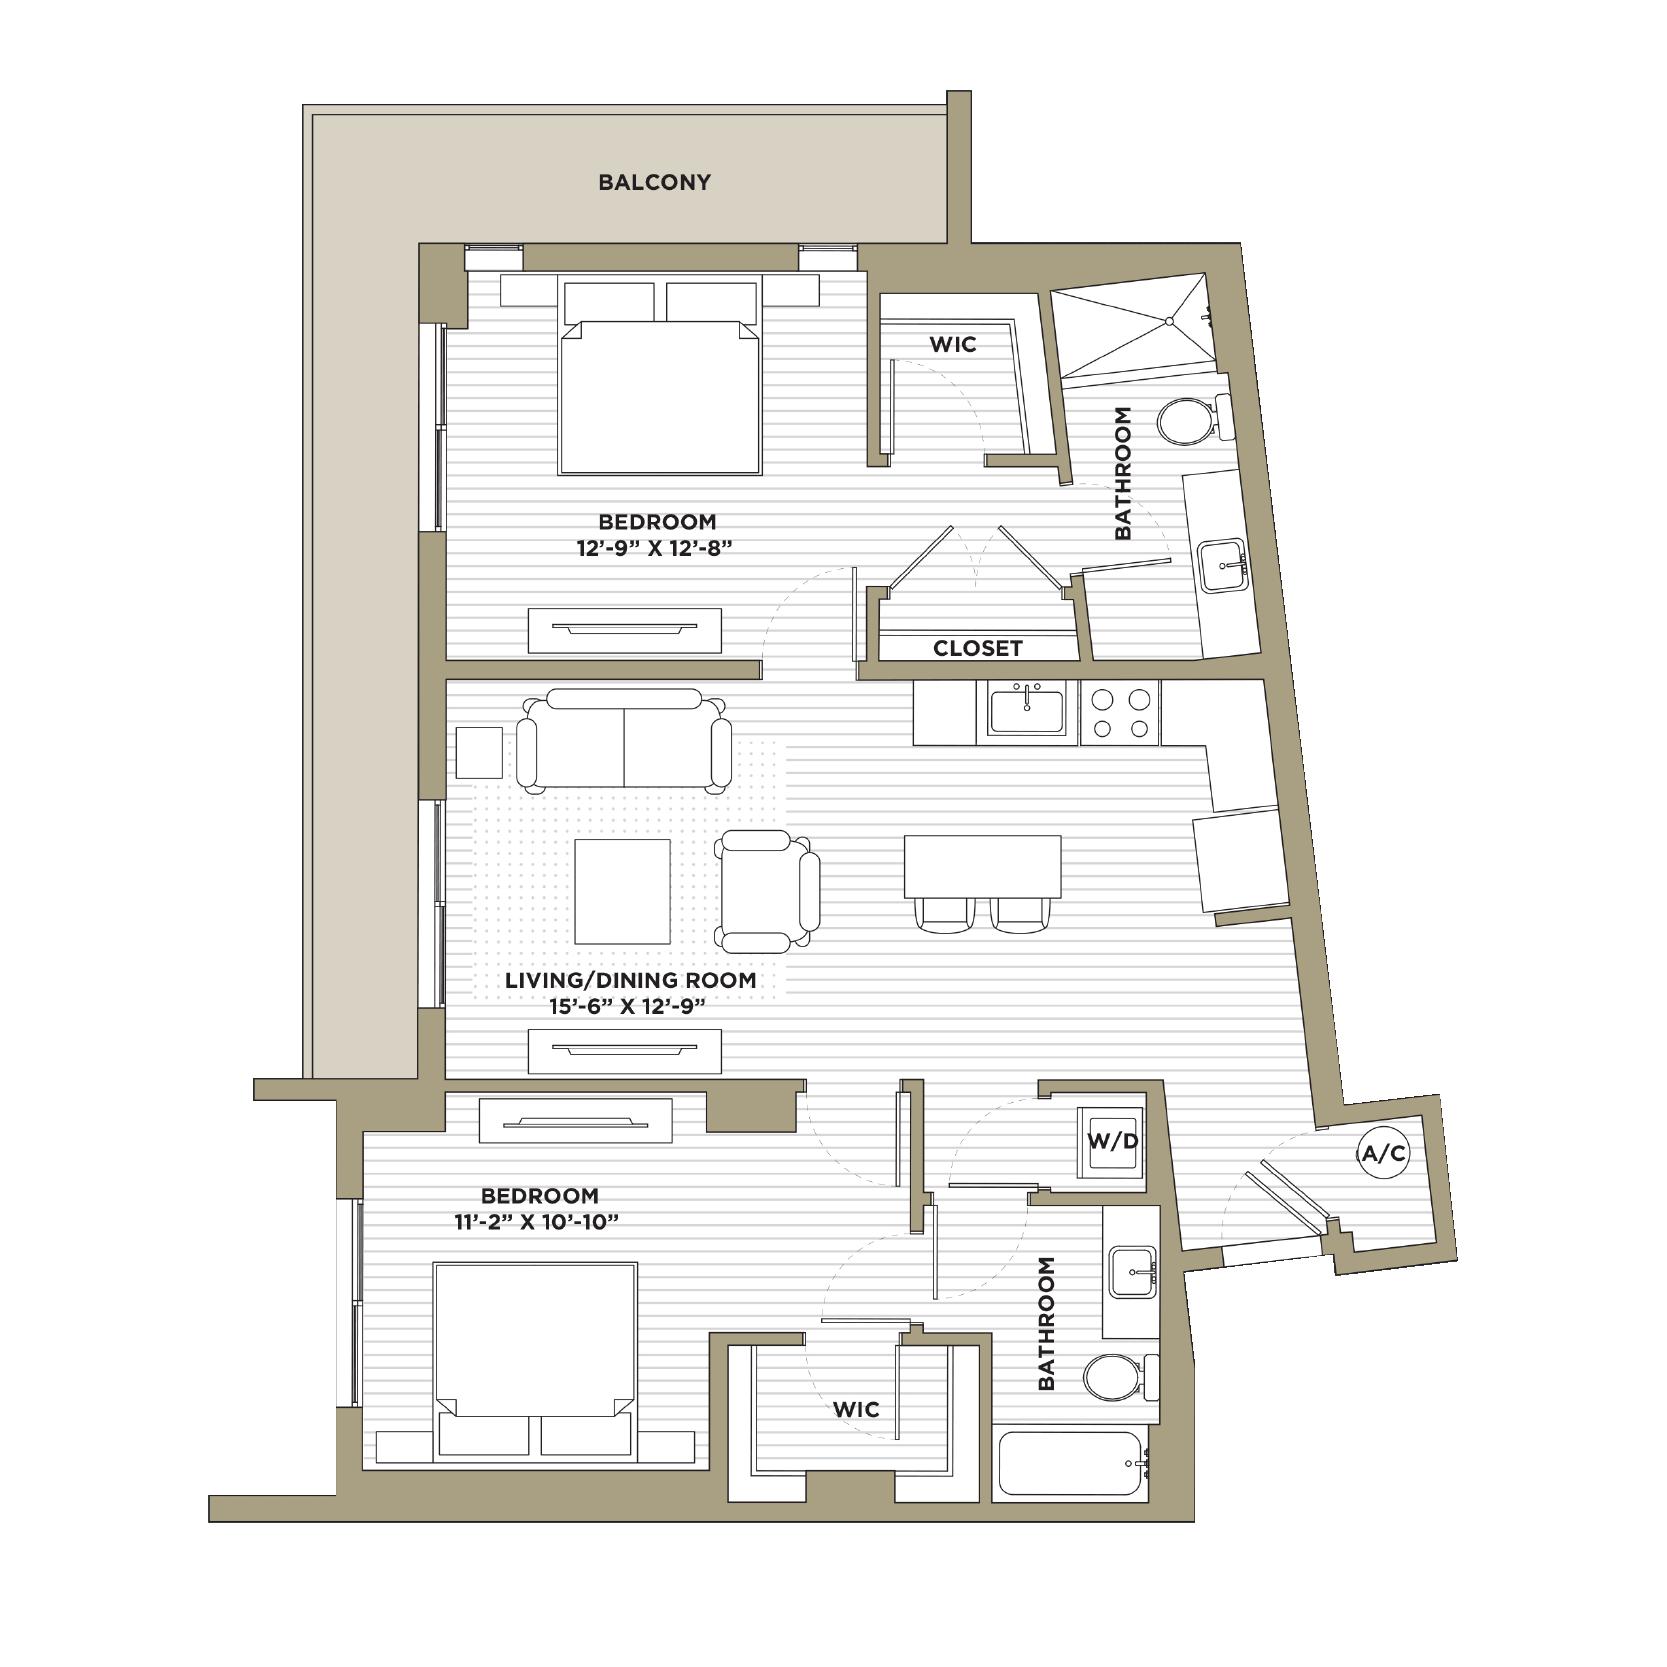 B5 / B5A - 2 Bedroom / 2 Bathroom1,152 / 1,151 sq. ft.